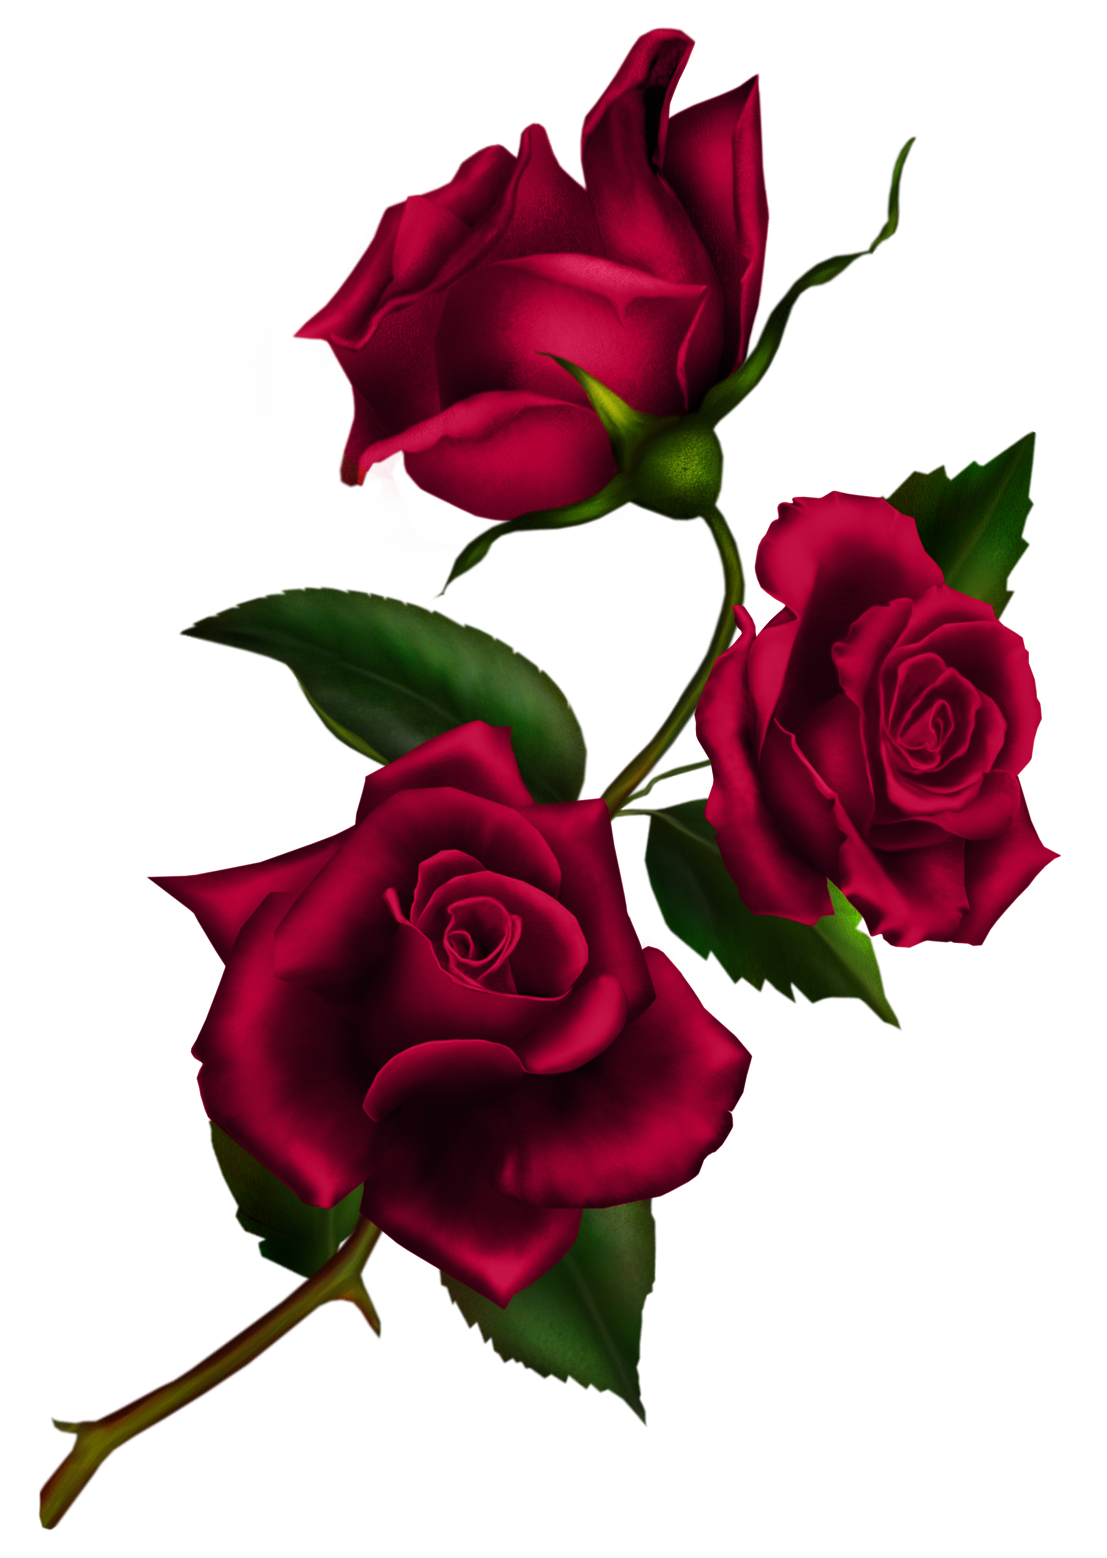 Rose Stem by Autumns-Muse on DeviantArt